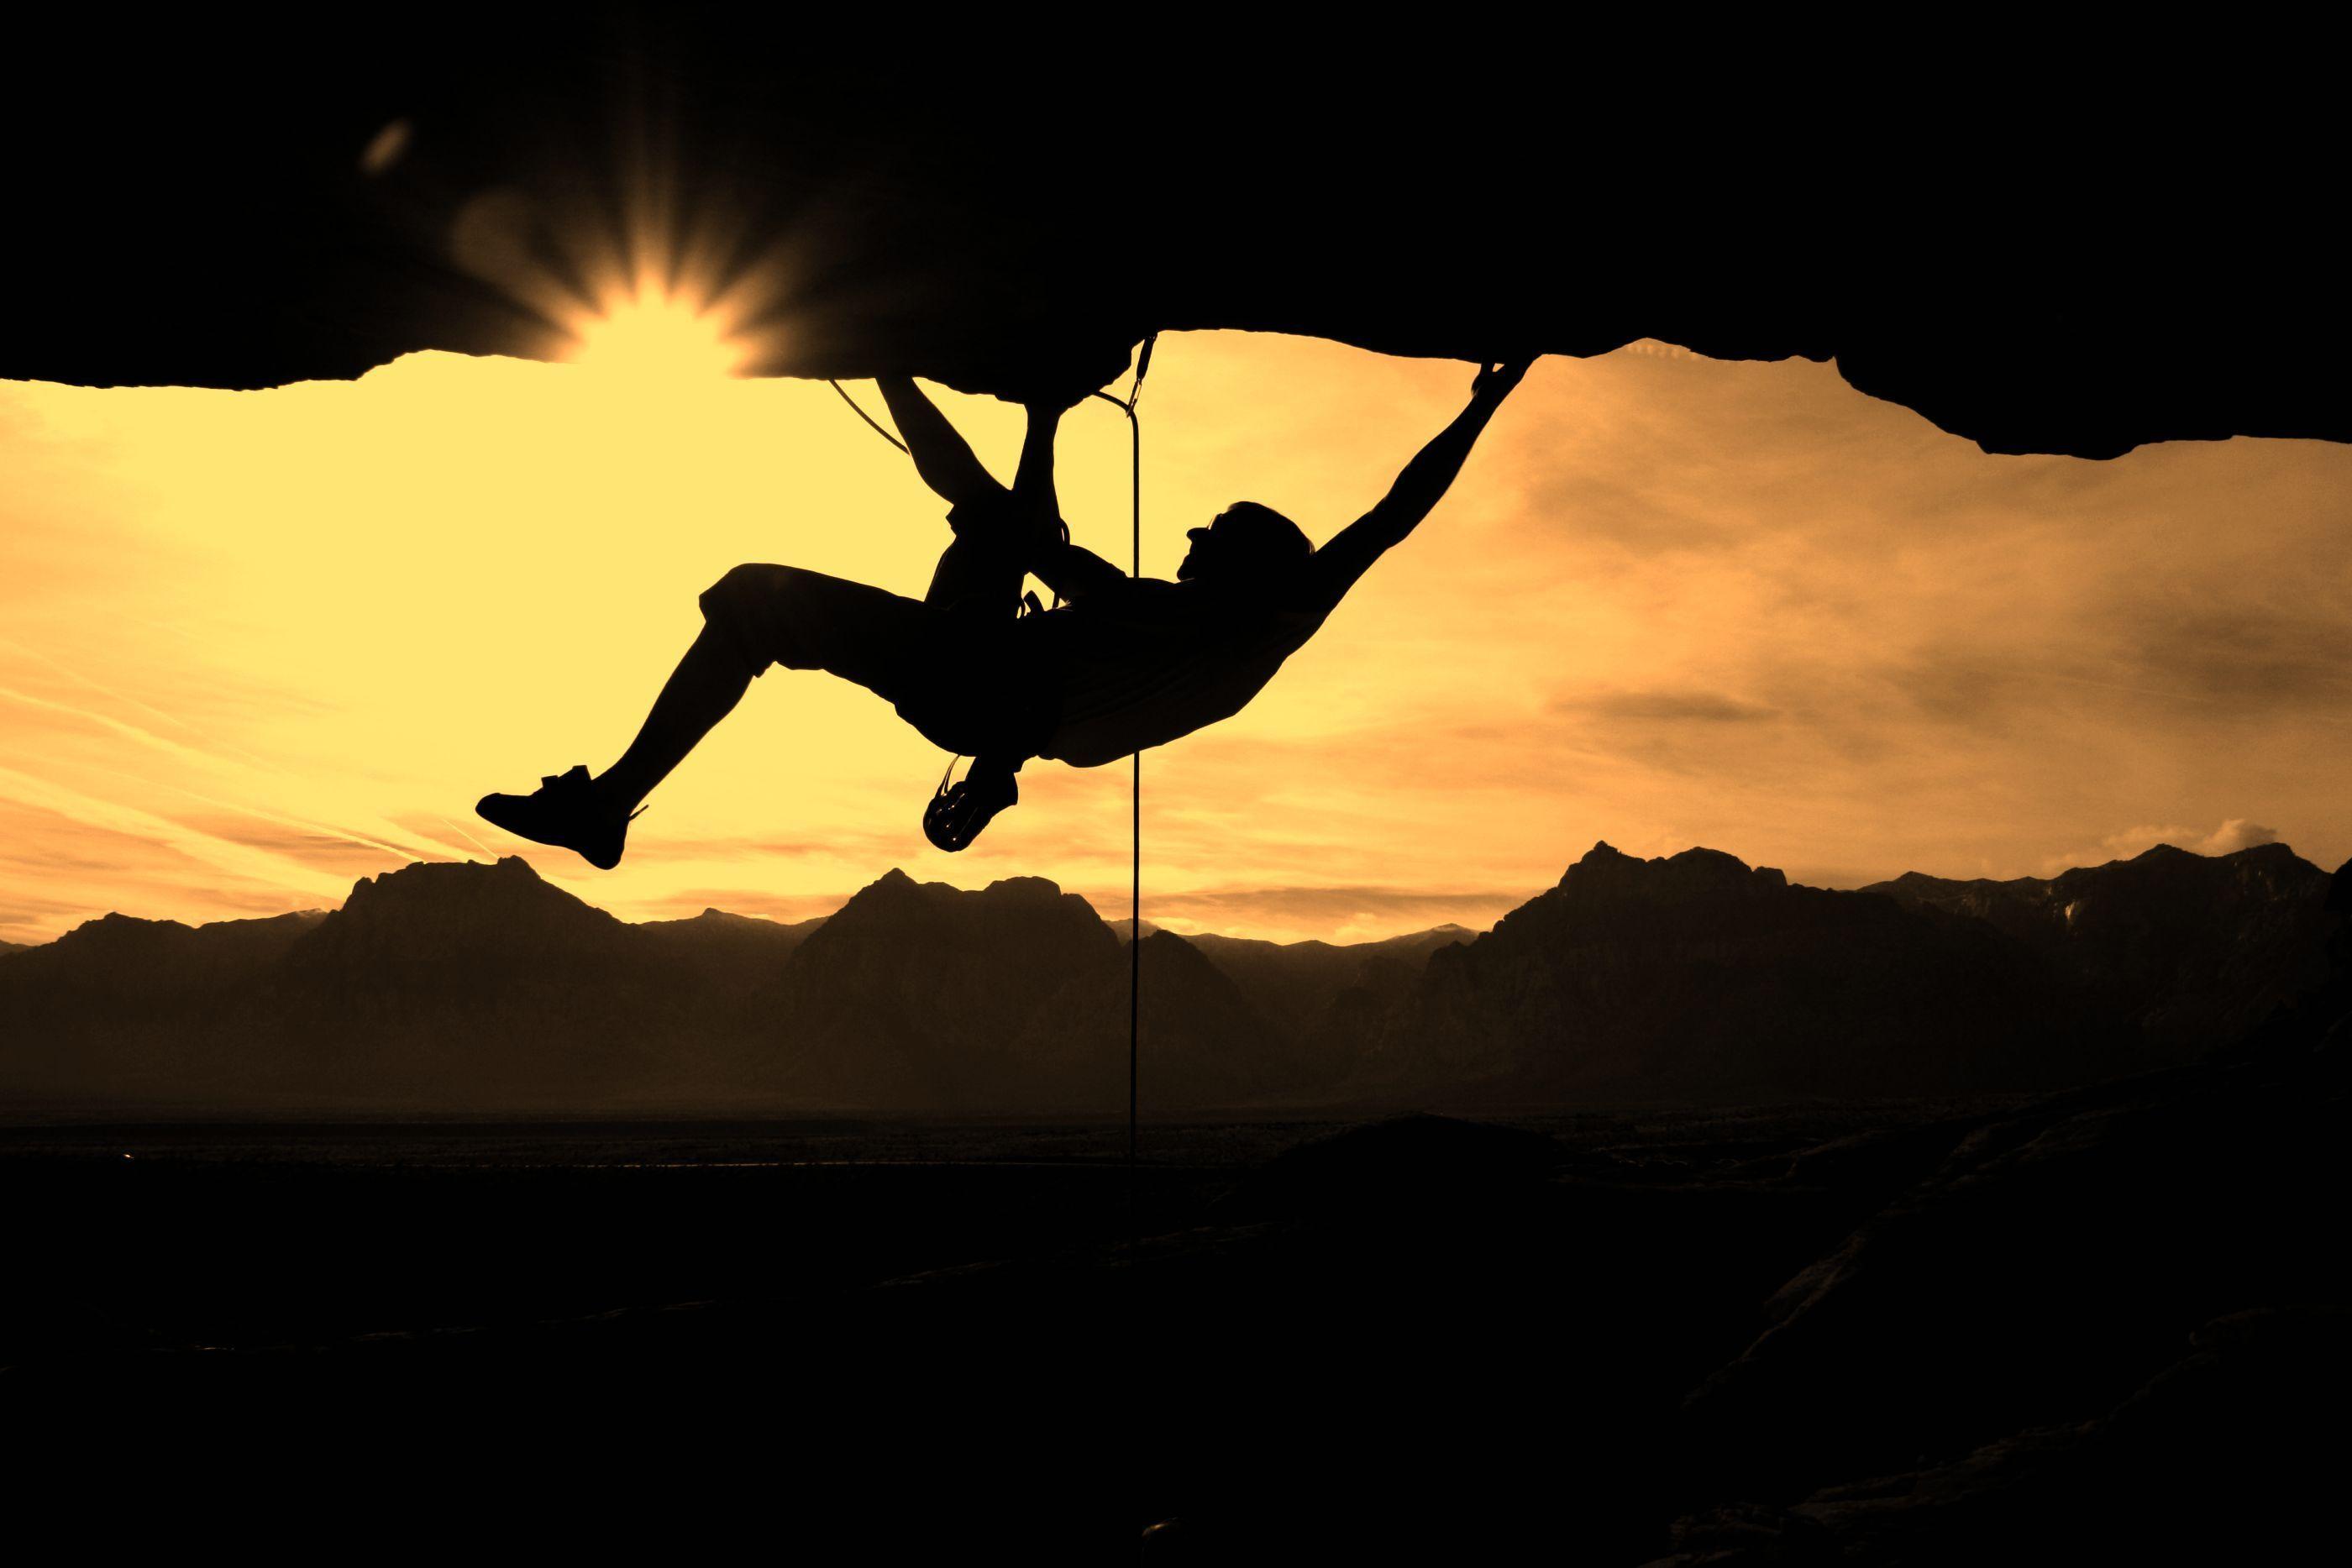 Rock Climbing Checklist | Backcountry Checklists | Pinterest | Rock ...